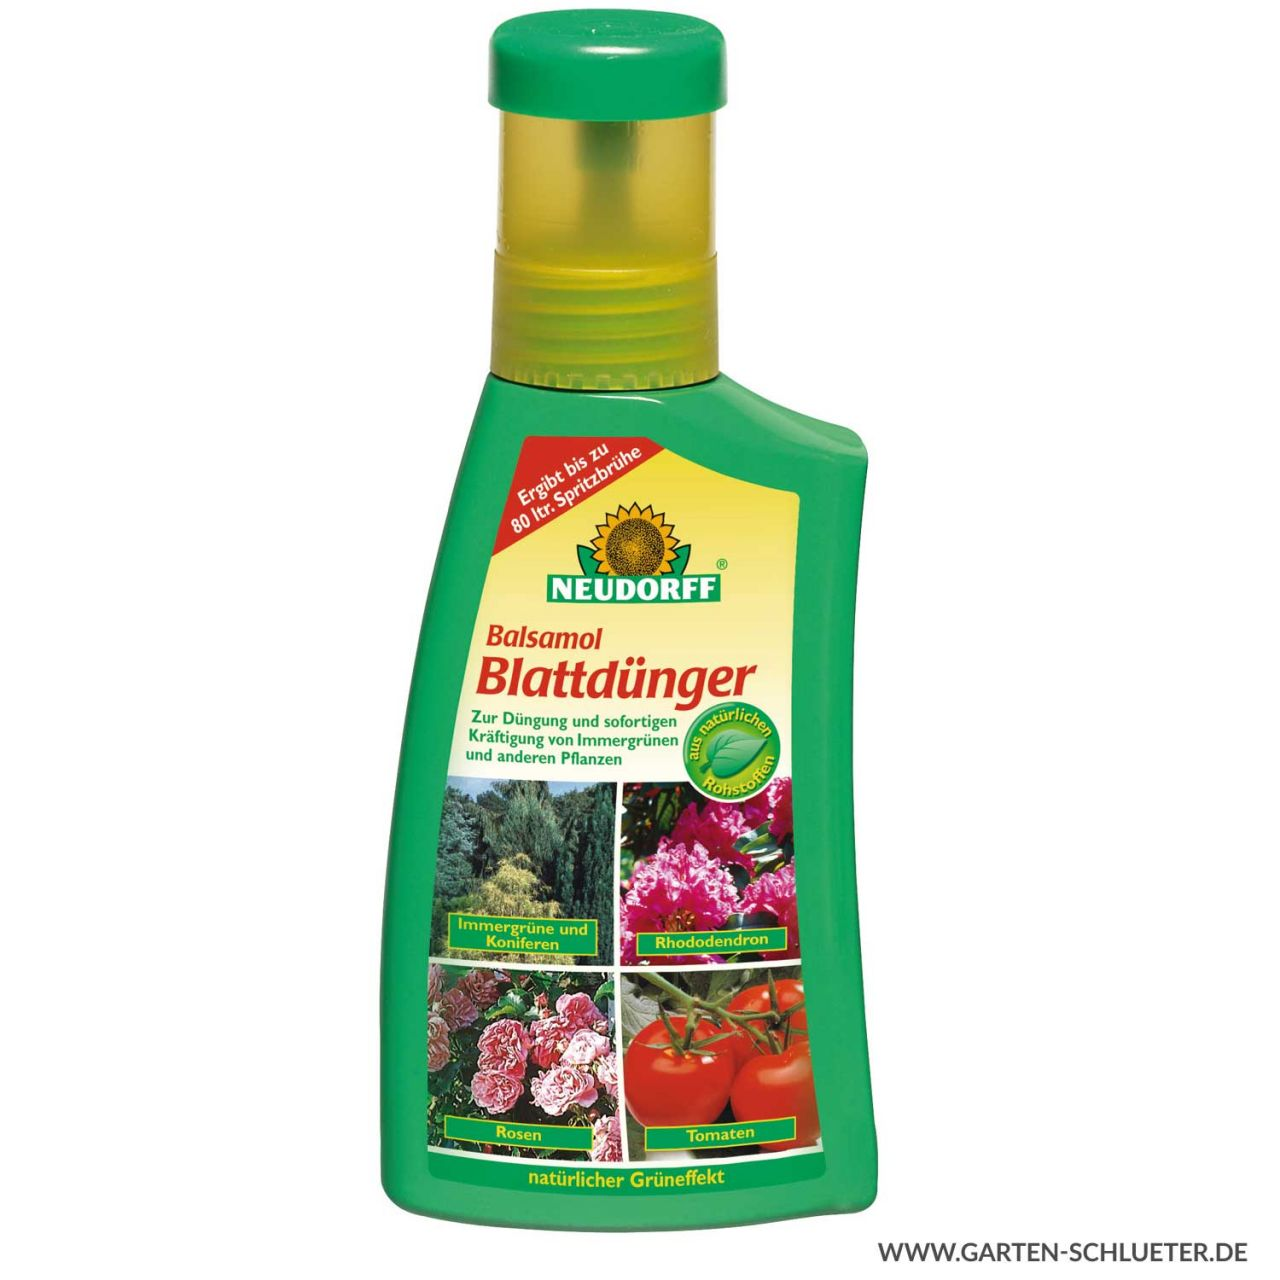 Neudorff Balsamol Blattdünger - 250 ml (ehemals Koniferen- Balsam Blattdünger)